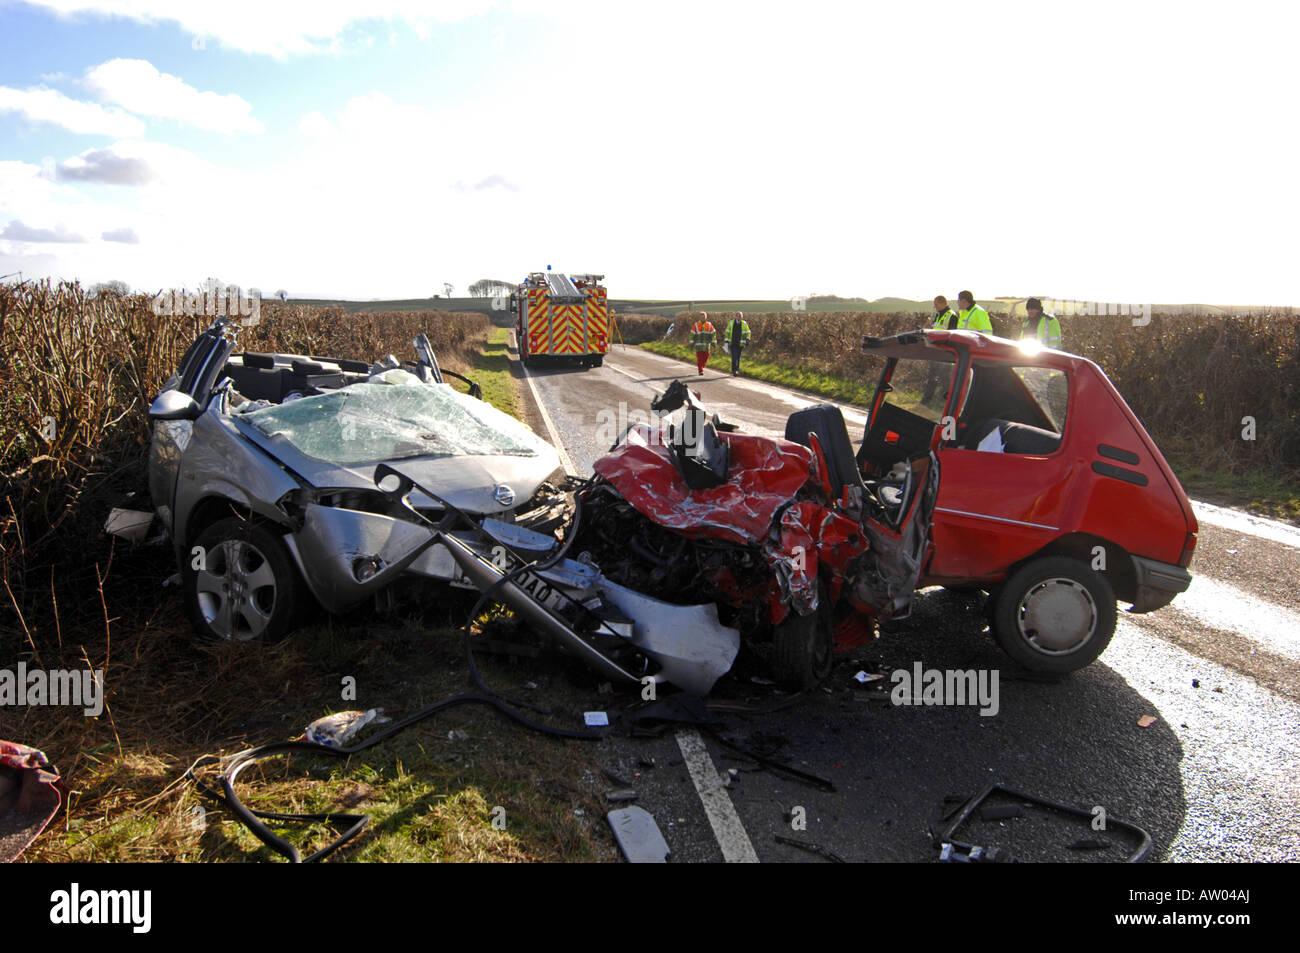 Scene of a fatal head on car crash that killed 4 people